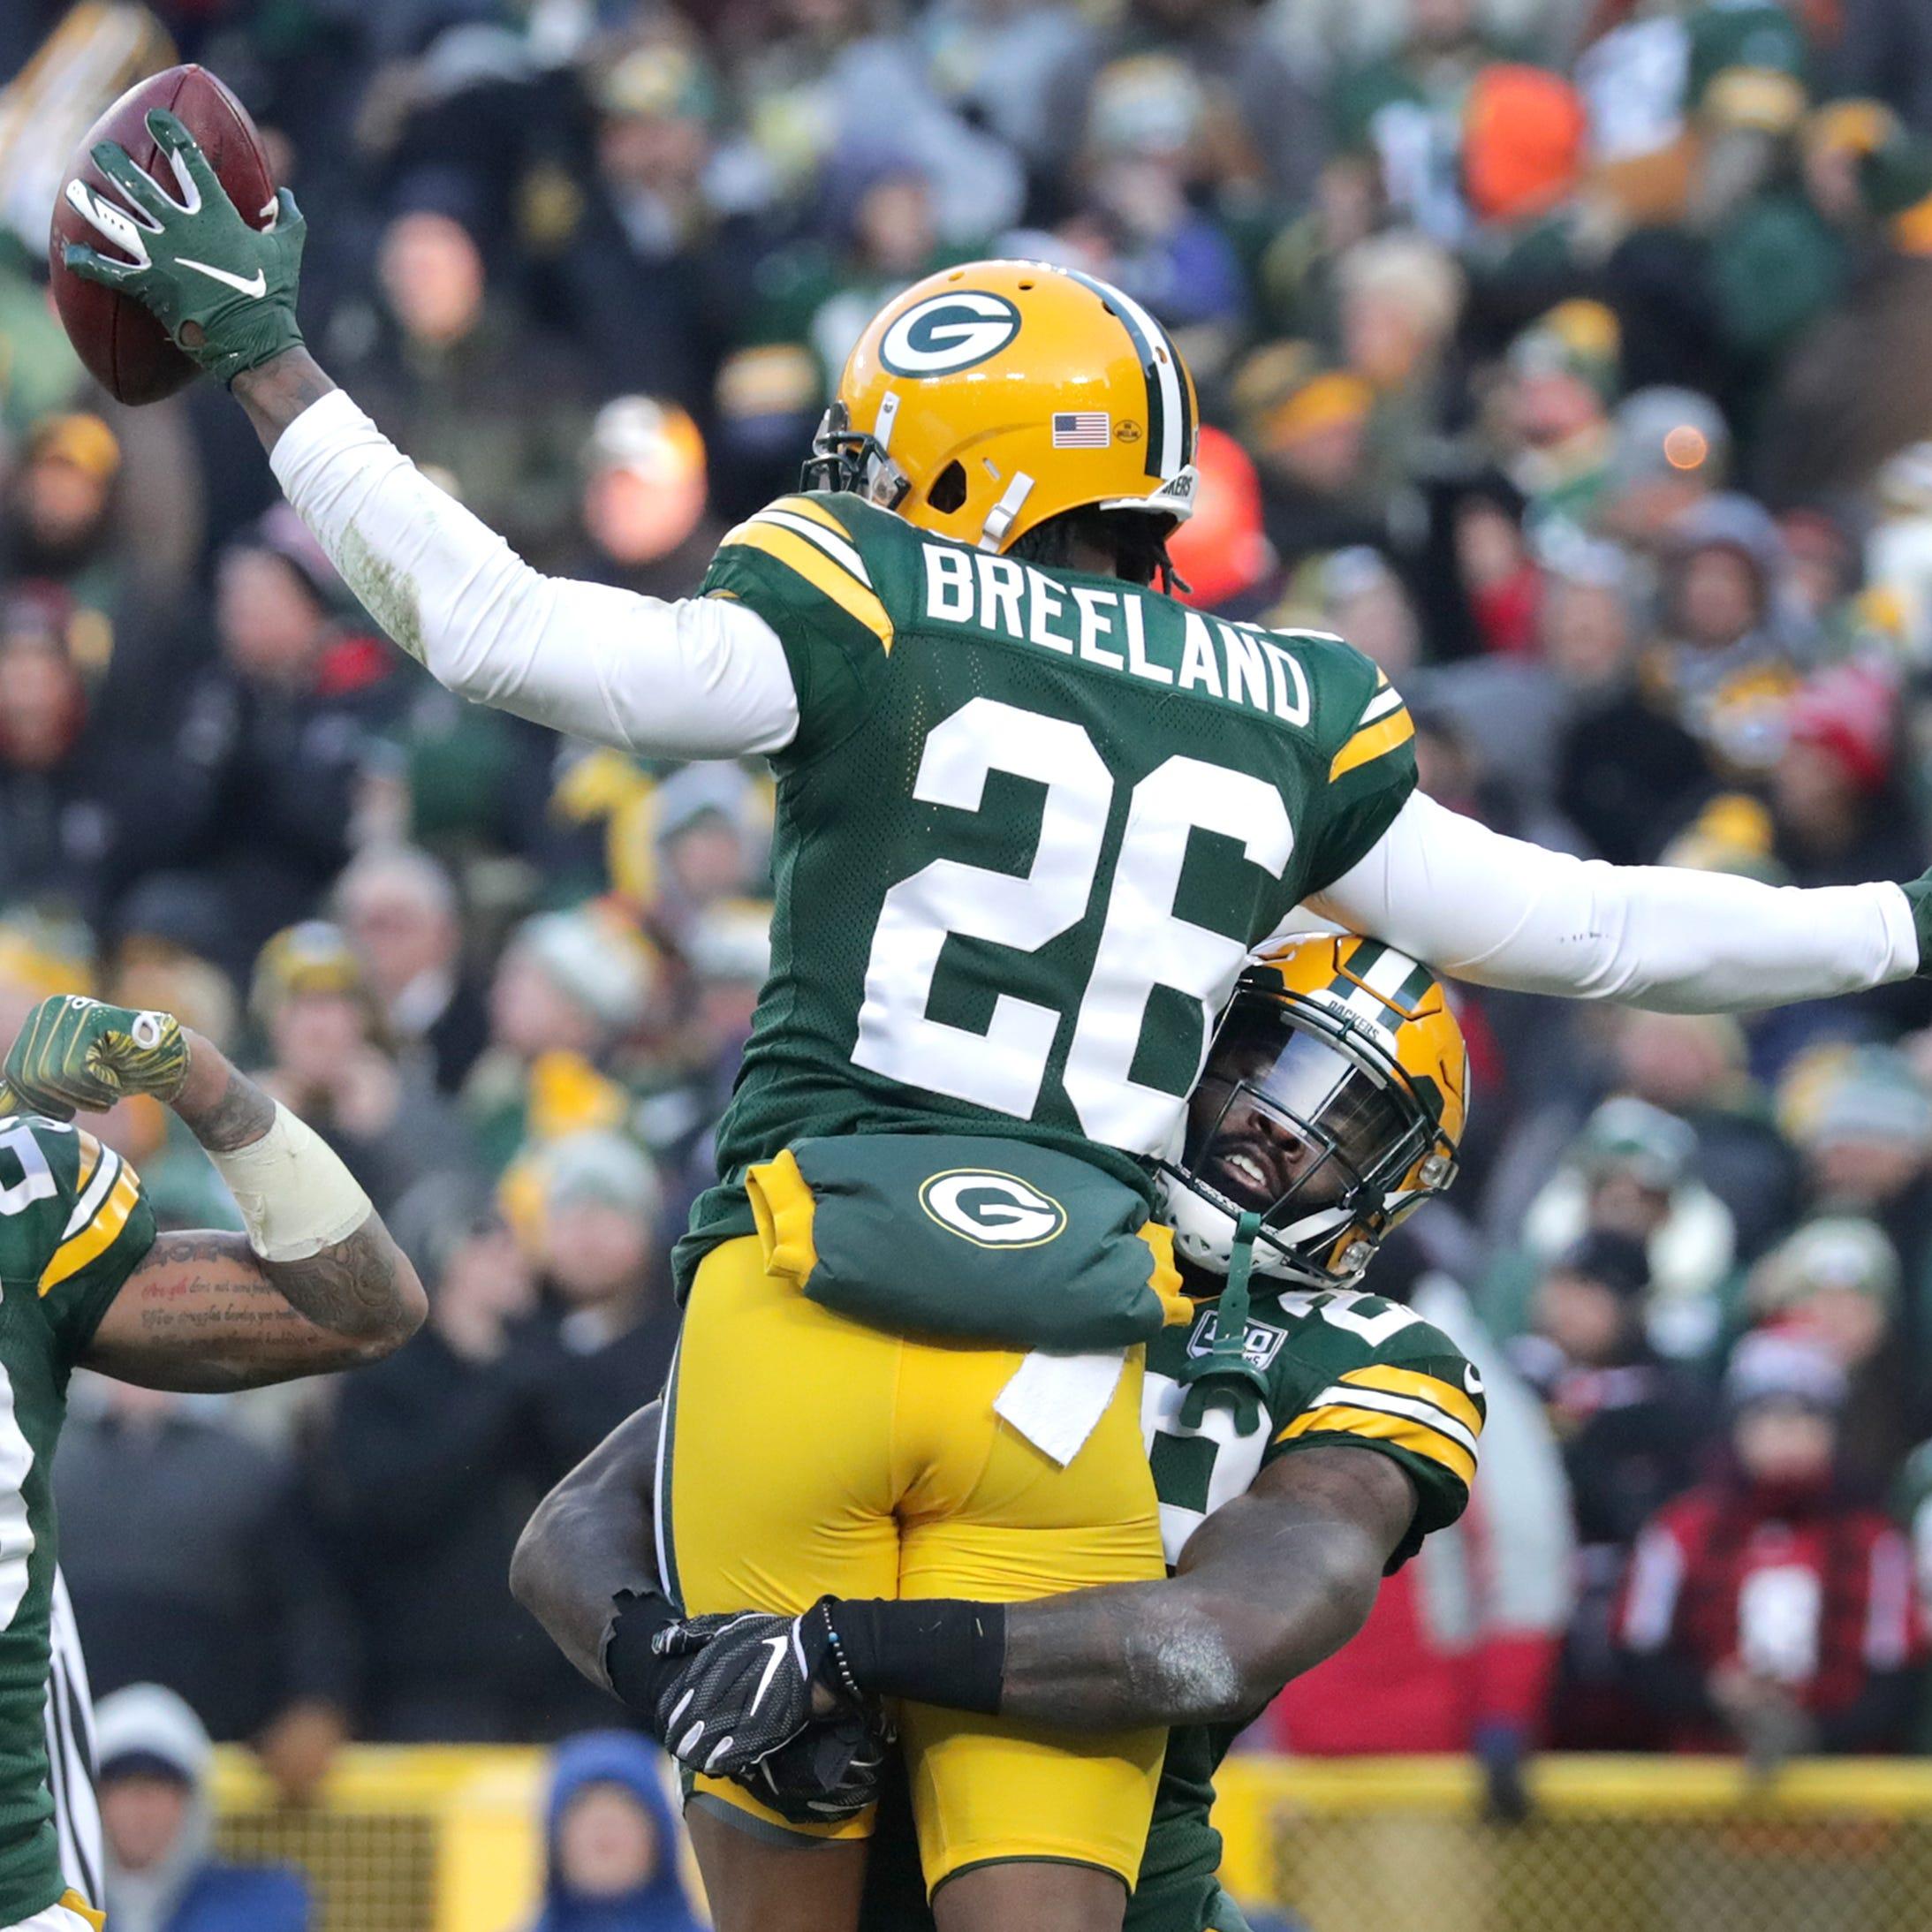 Cornerback Bashaud Breeland hoping Packers take leap of faith on him